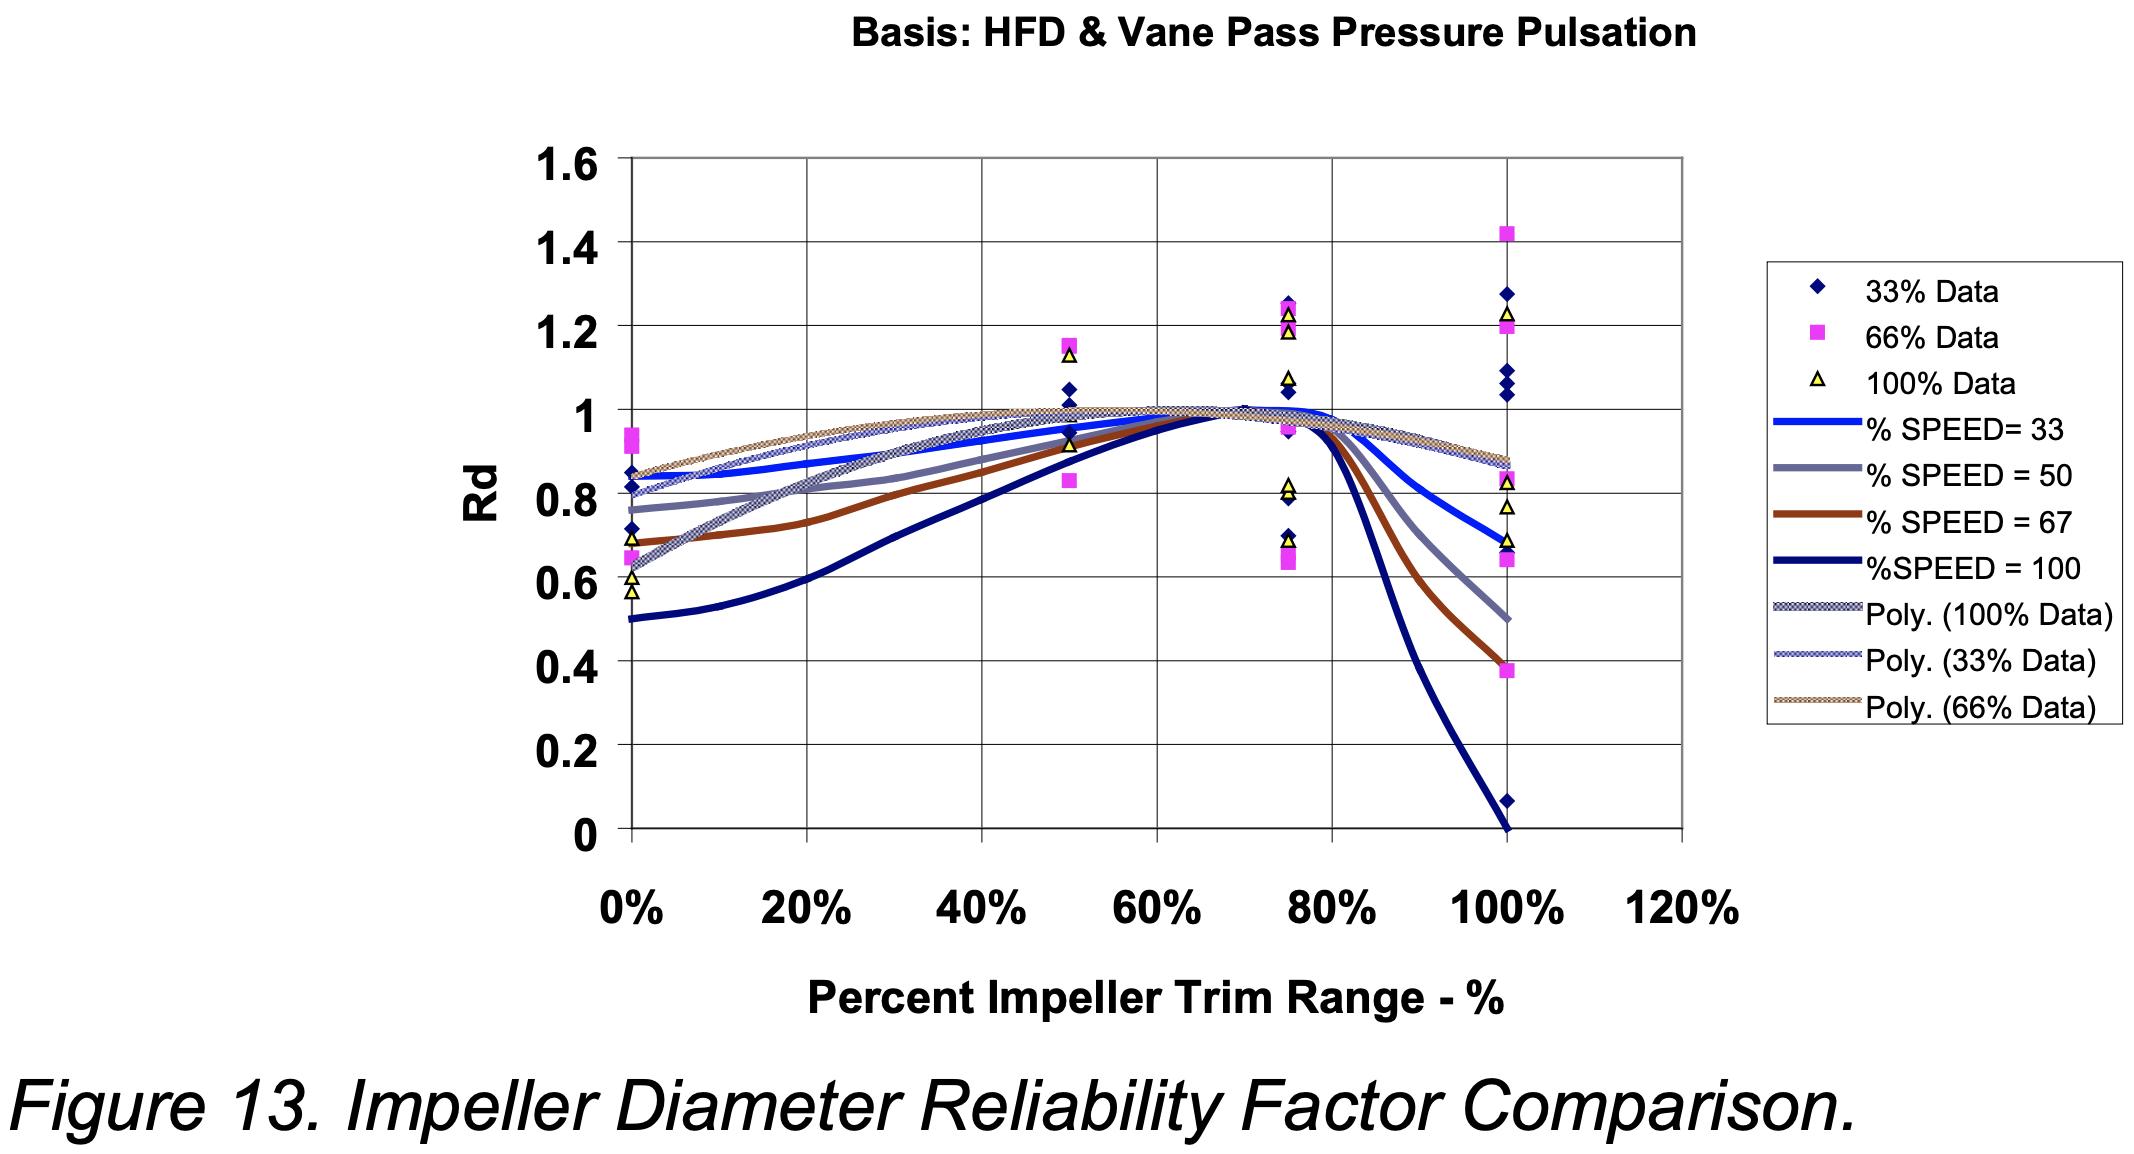 Impeller Diameter Reliability Chart